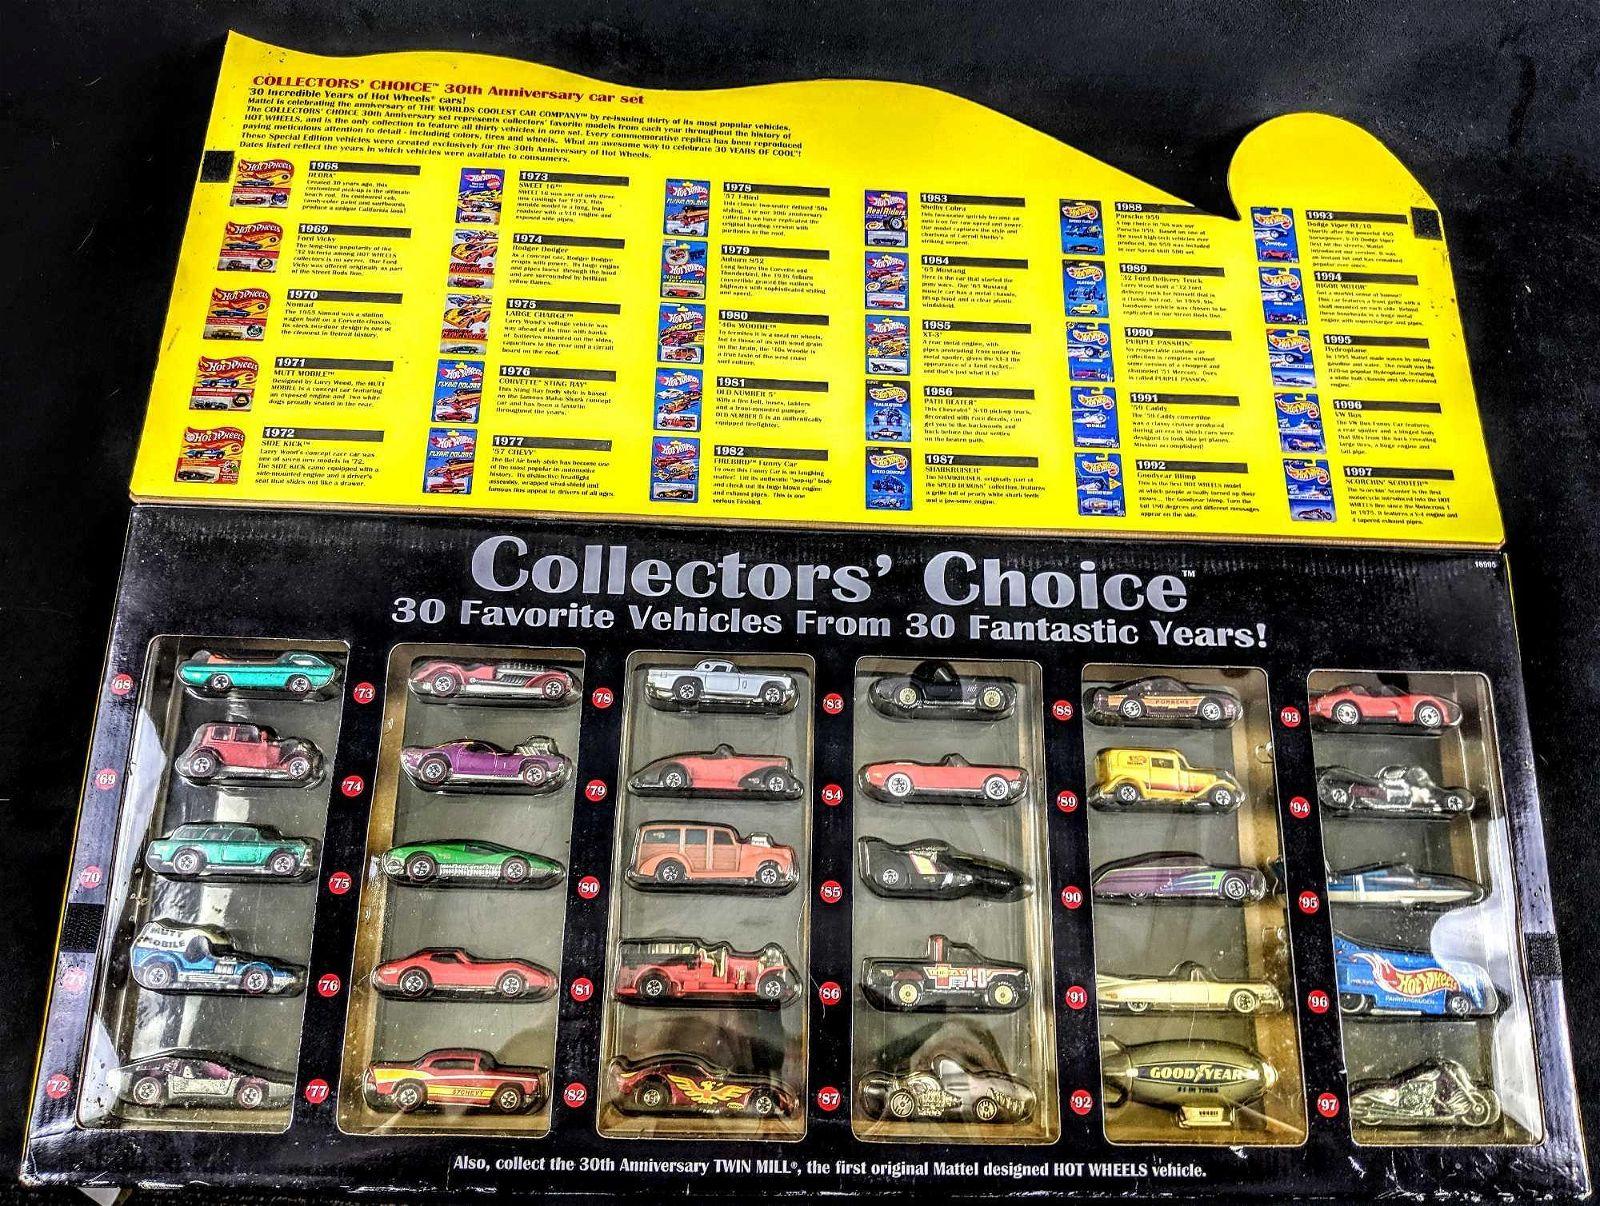 1998 Mattel Hot Wheels Collectors Choice Boxed Die Cast